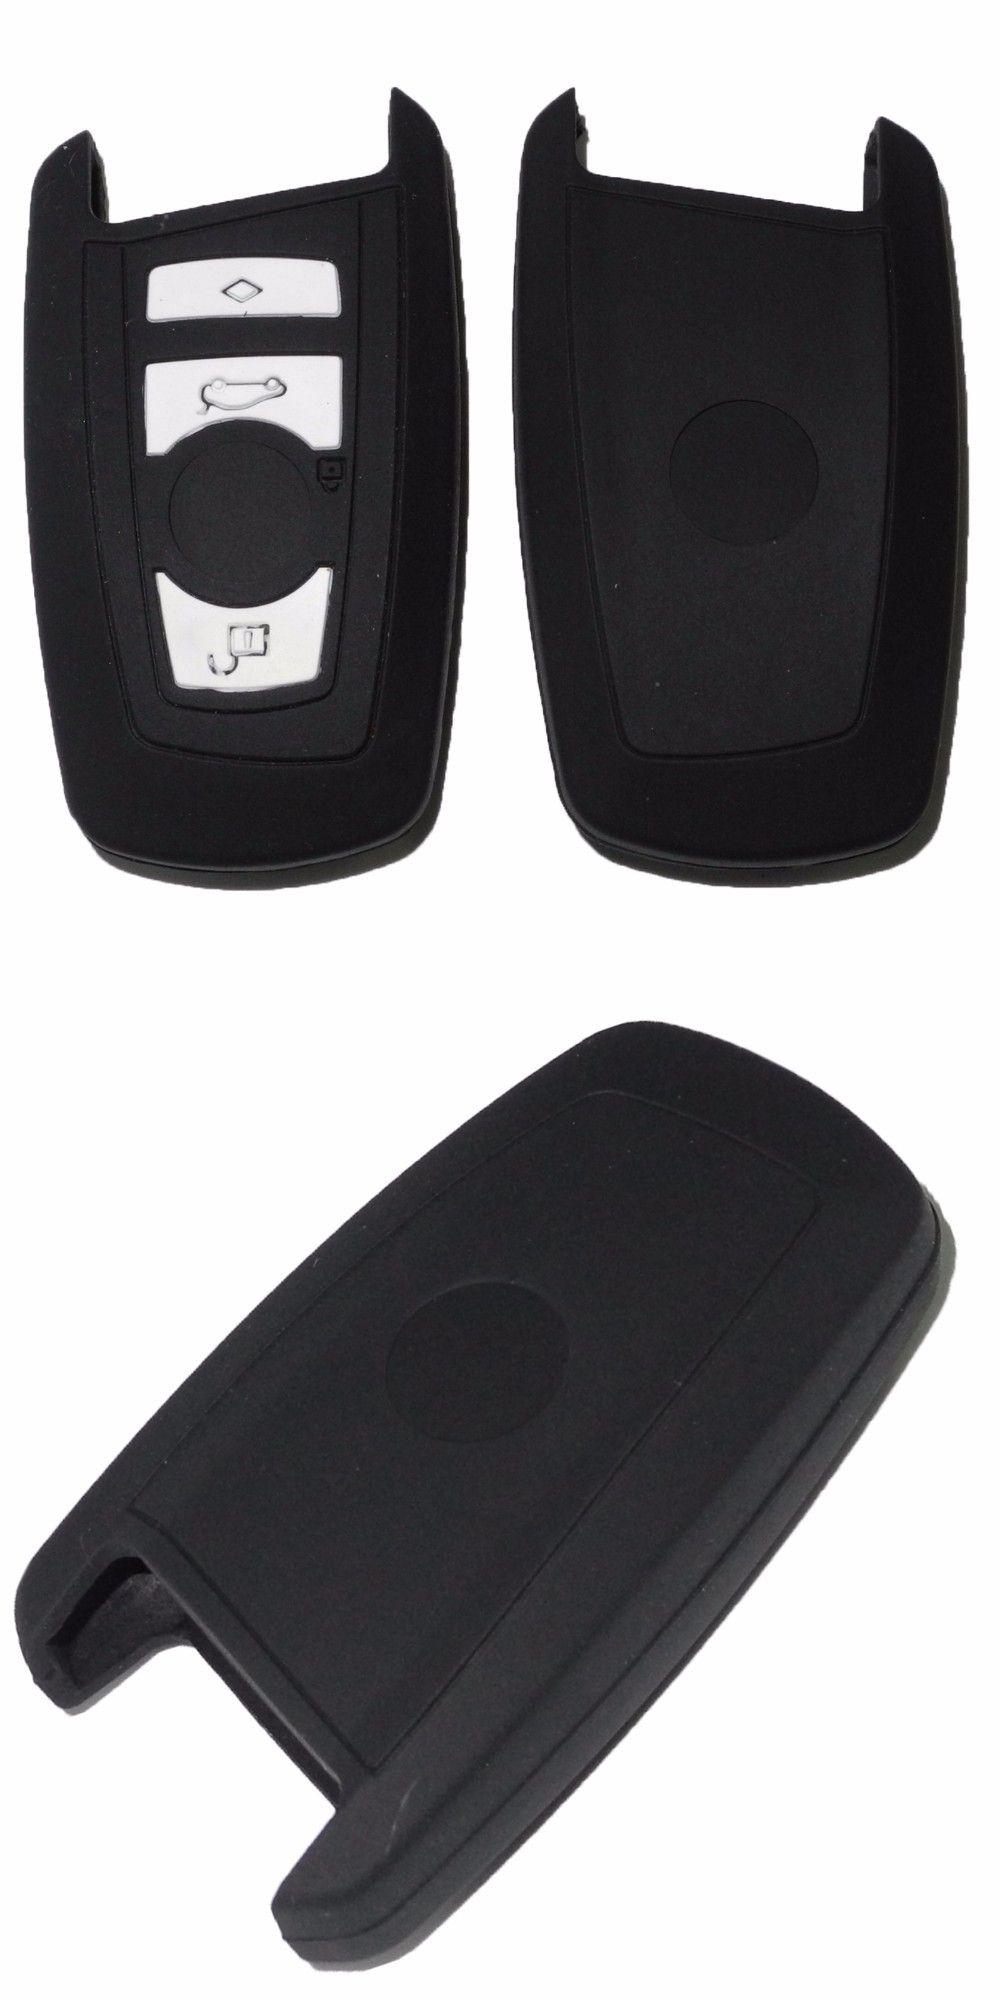 keys smart key bmw wholesale for